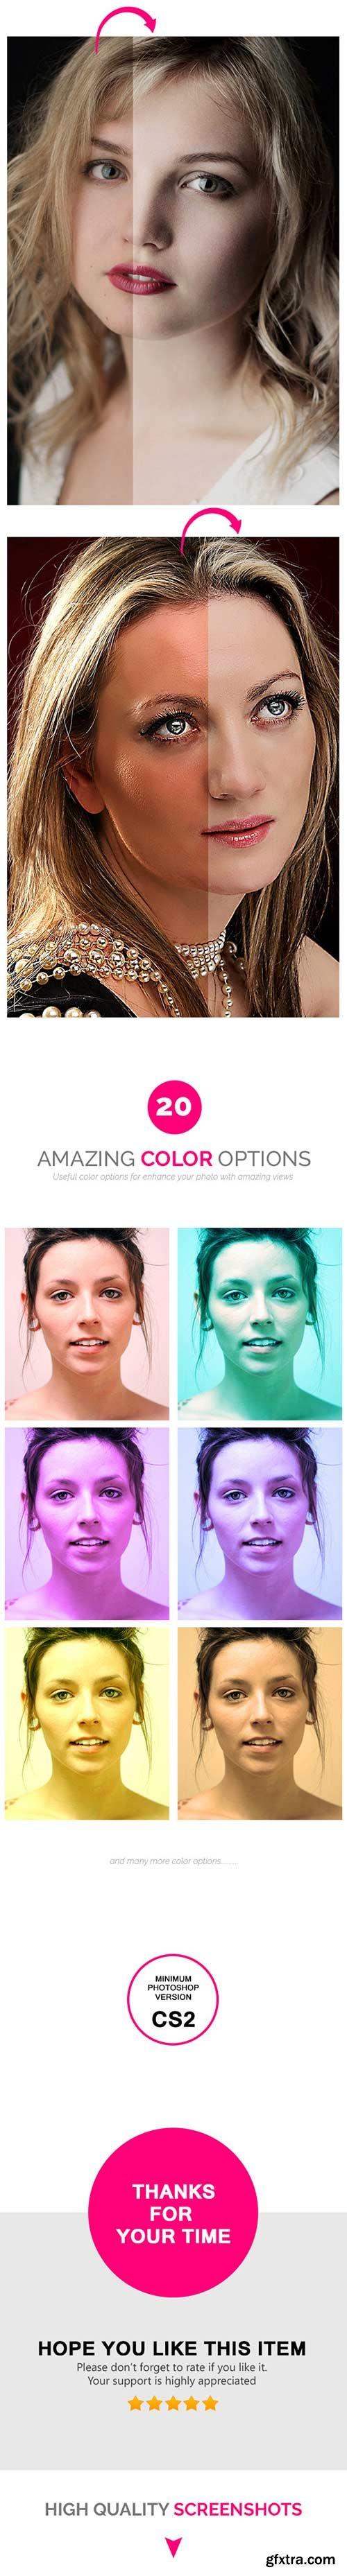 GraphicRiver - Pro Beauty Retouch - PHOTOSHOP ACTION 11303319